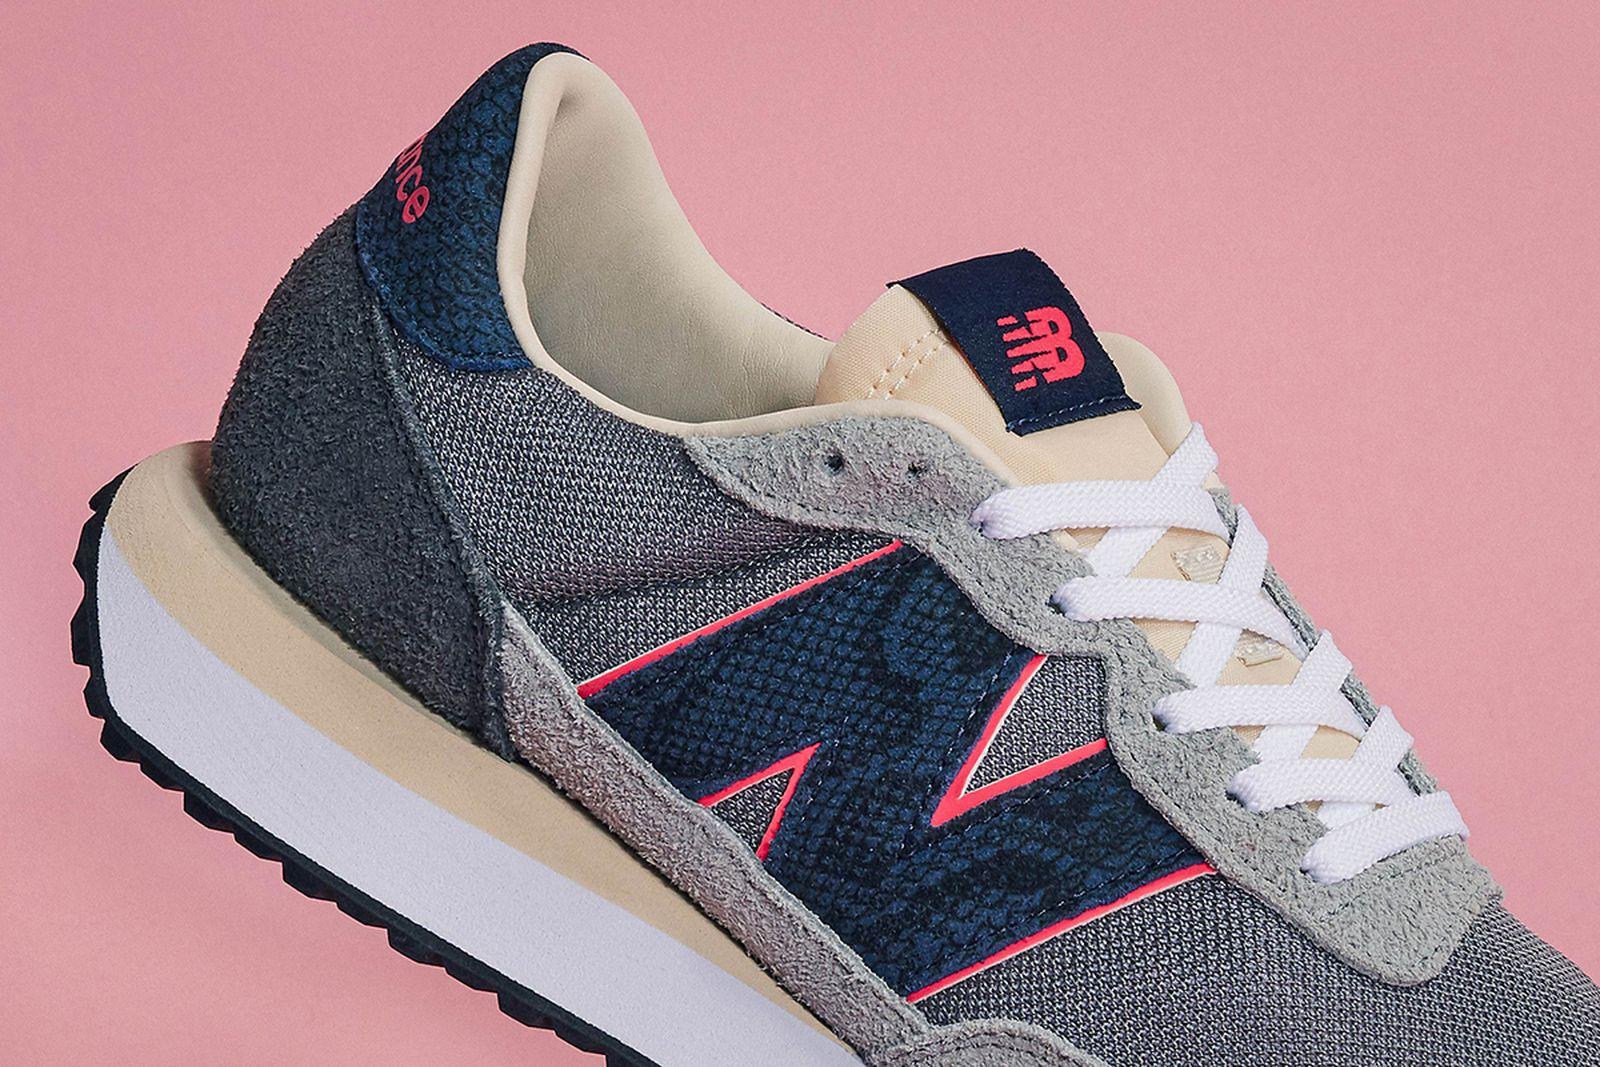 sneakersnstuff-new-balance-237-release-date-price-10